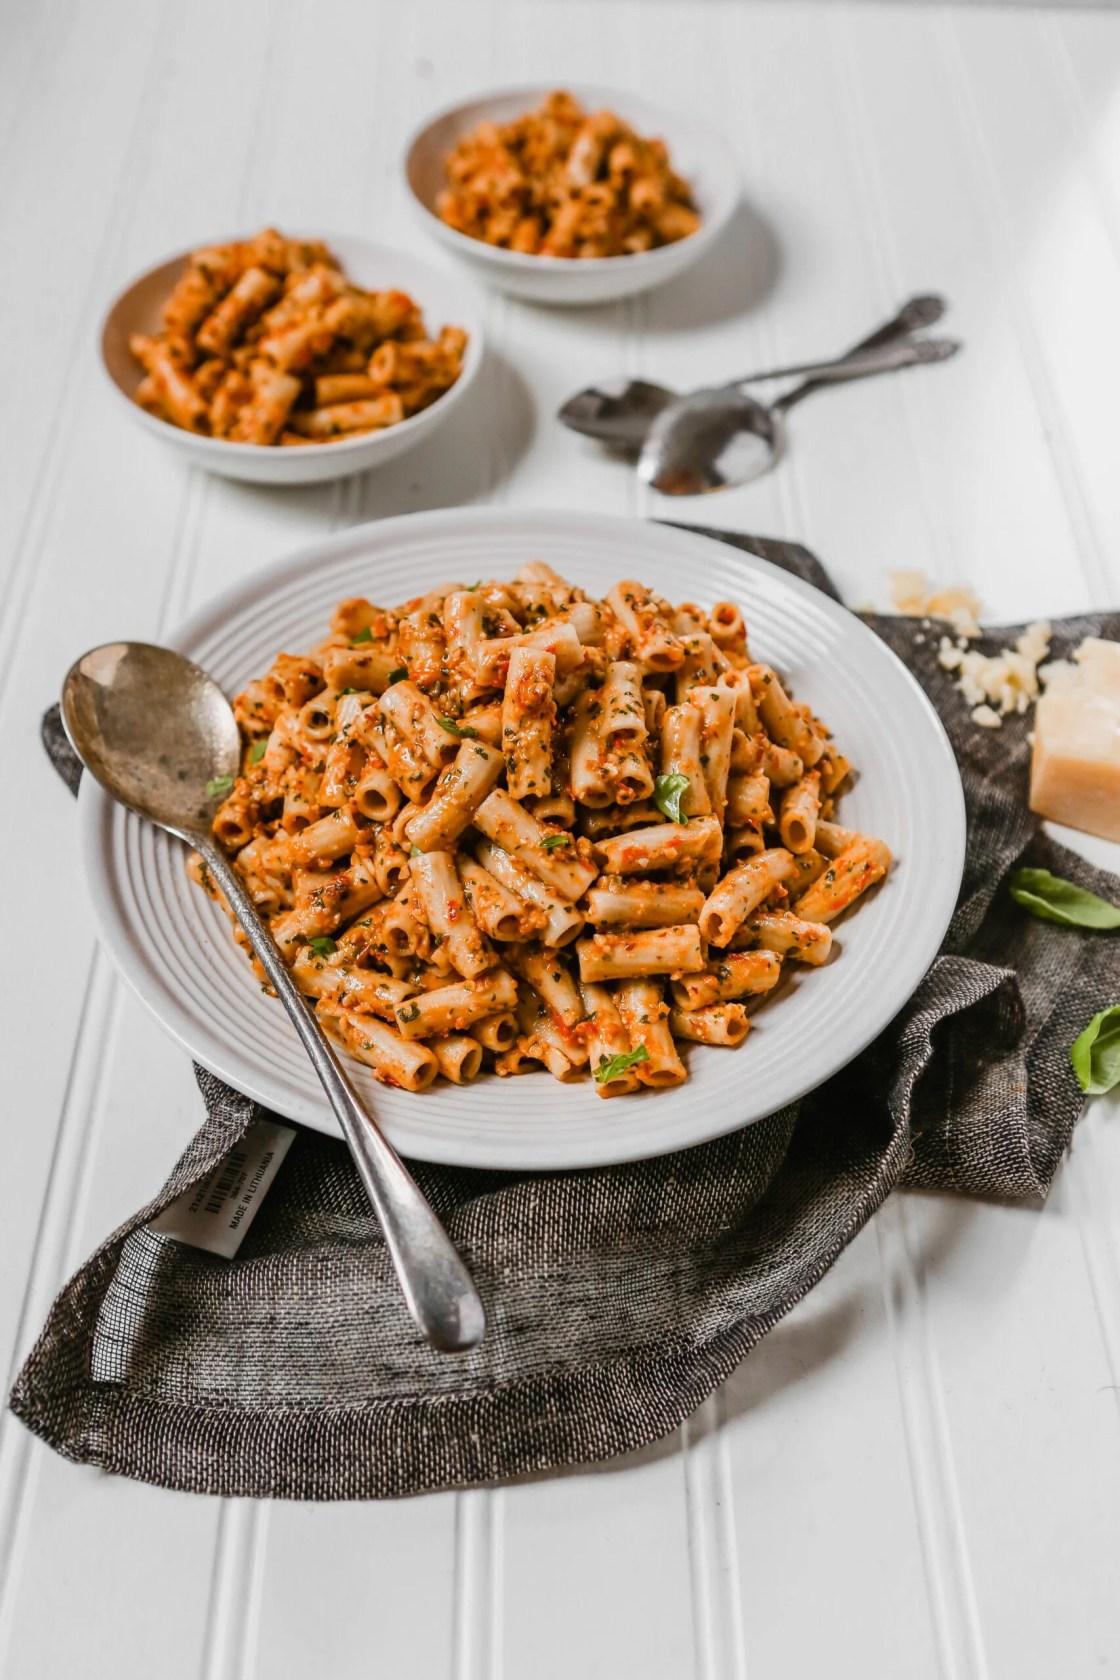 Photography of Trapanese pesto pasta piled into a white bowl with a dark napkin around it